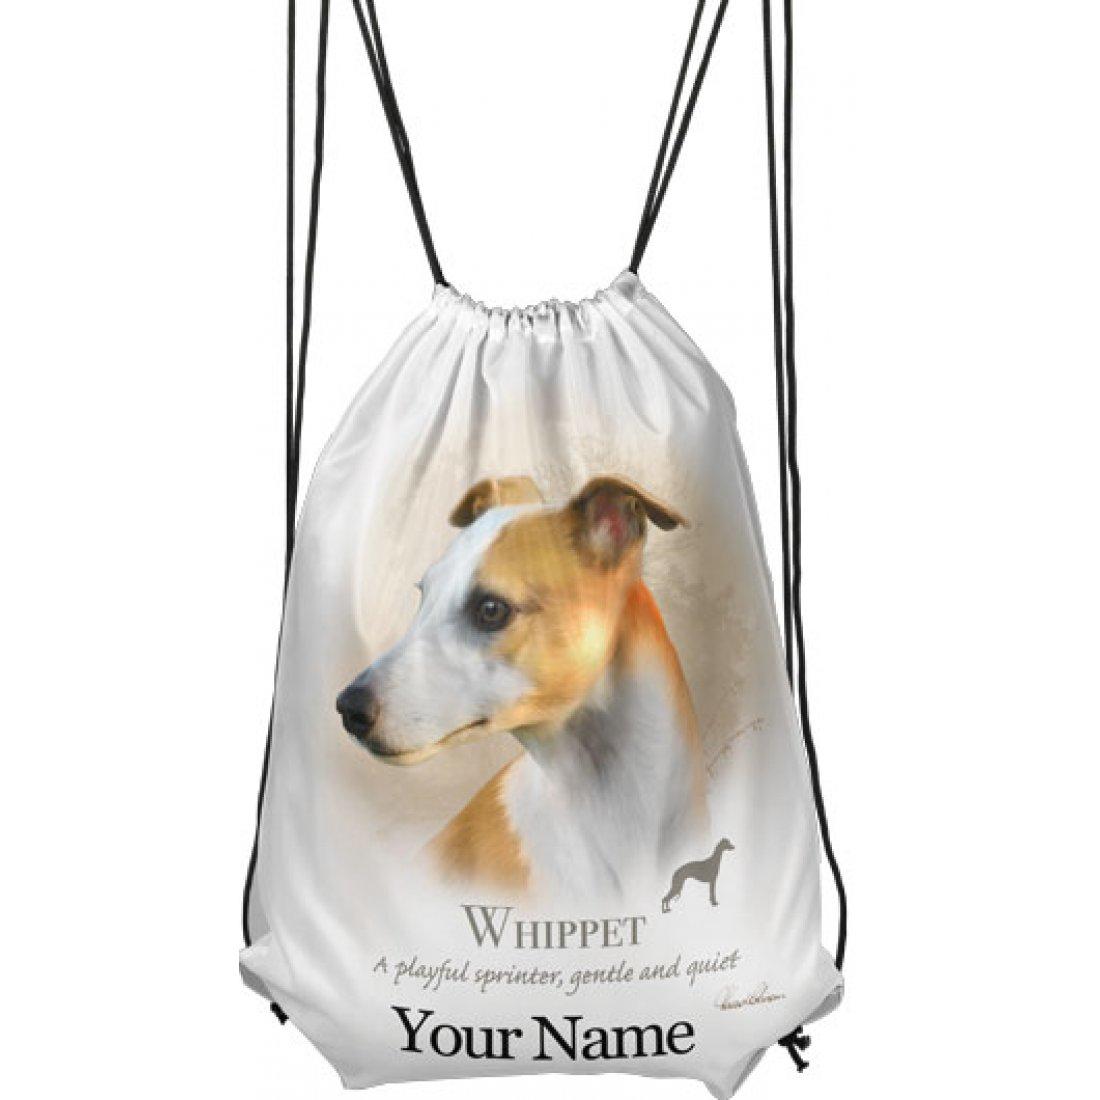 Personalised Whippet Drawstring Gym Bag